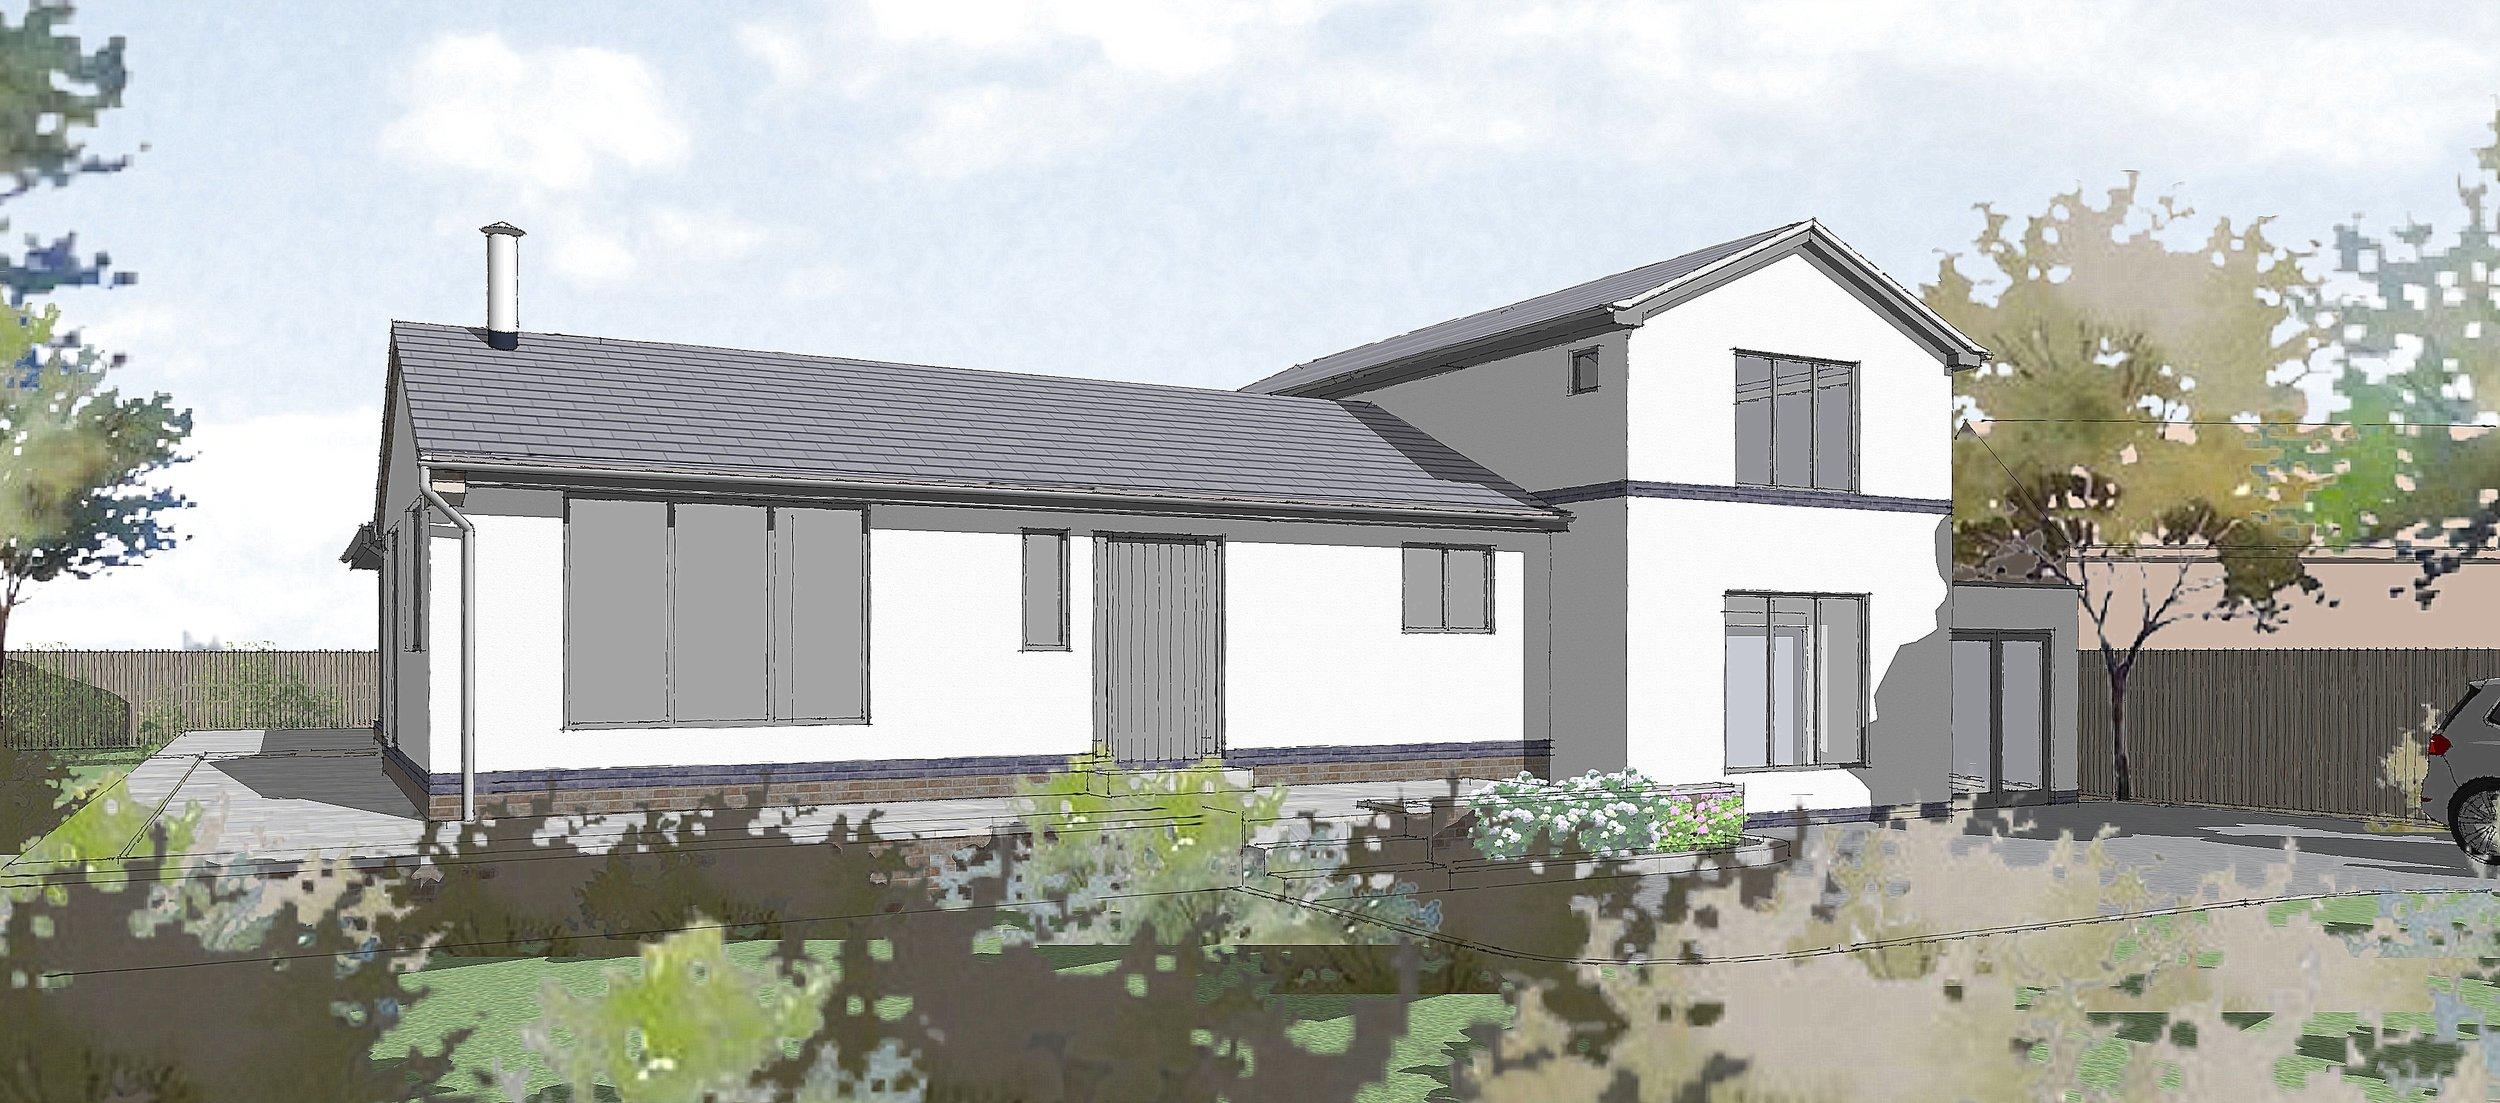 House Remodelling, Scropton, Derbyshire